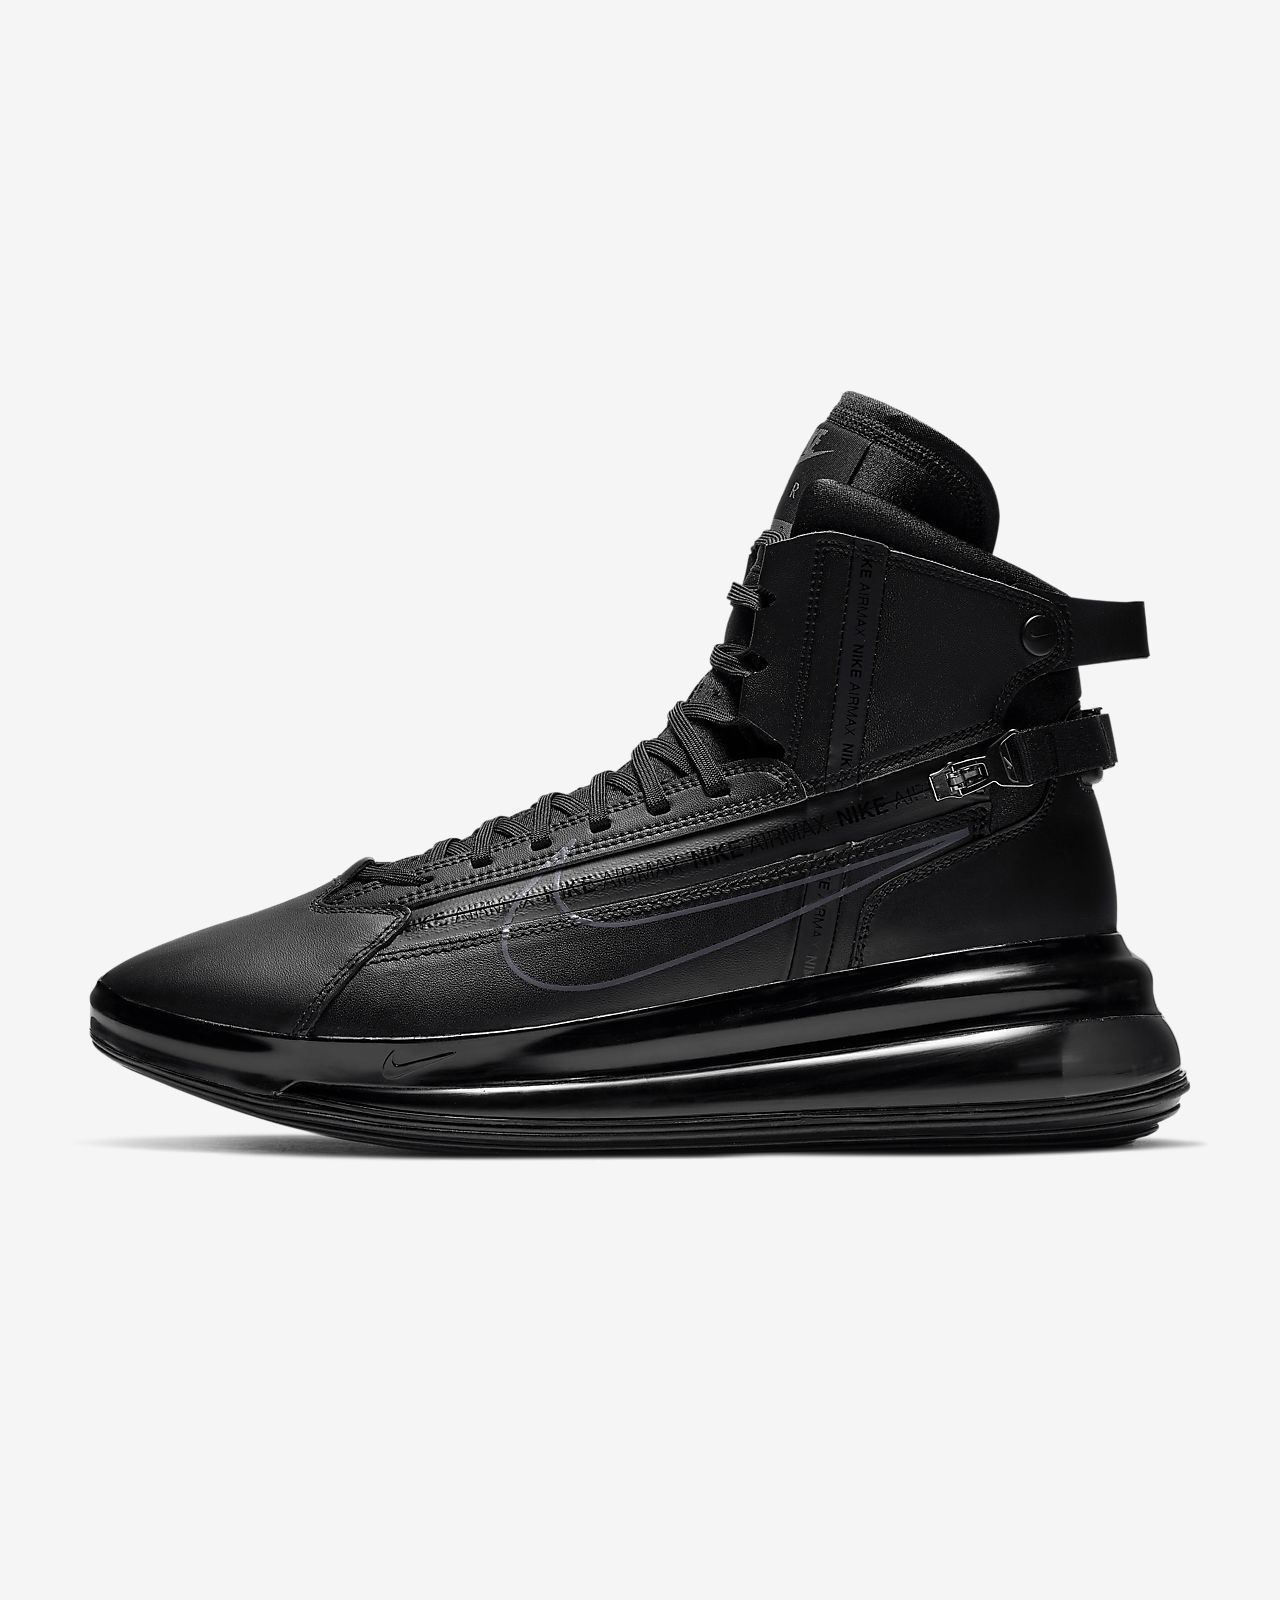 Nike Air Max 720 SATRN 男子运动鞋